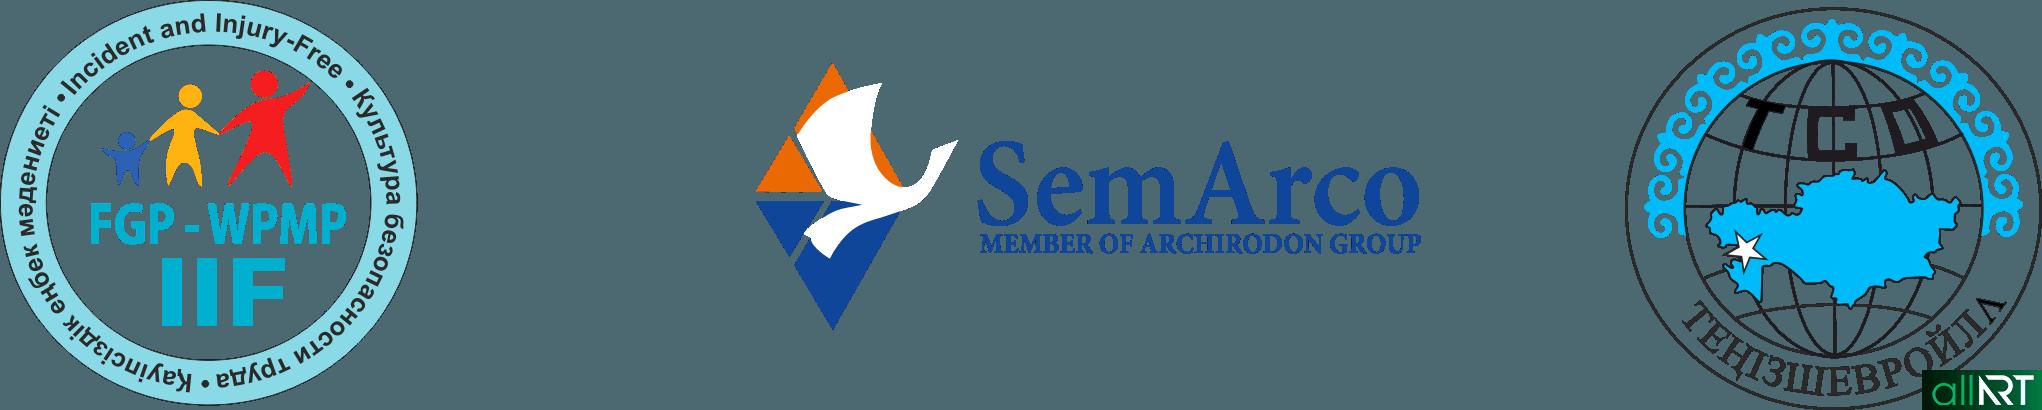 Логотип Культура безопасности труда, тенизшевроил, semarco в векторе [CDR]